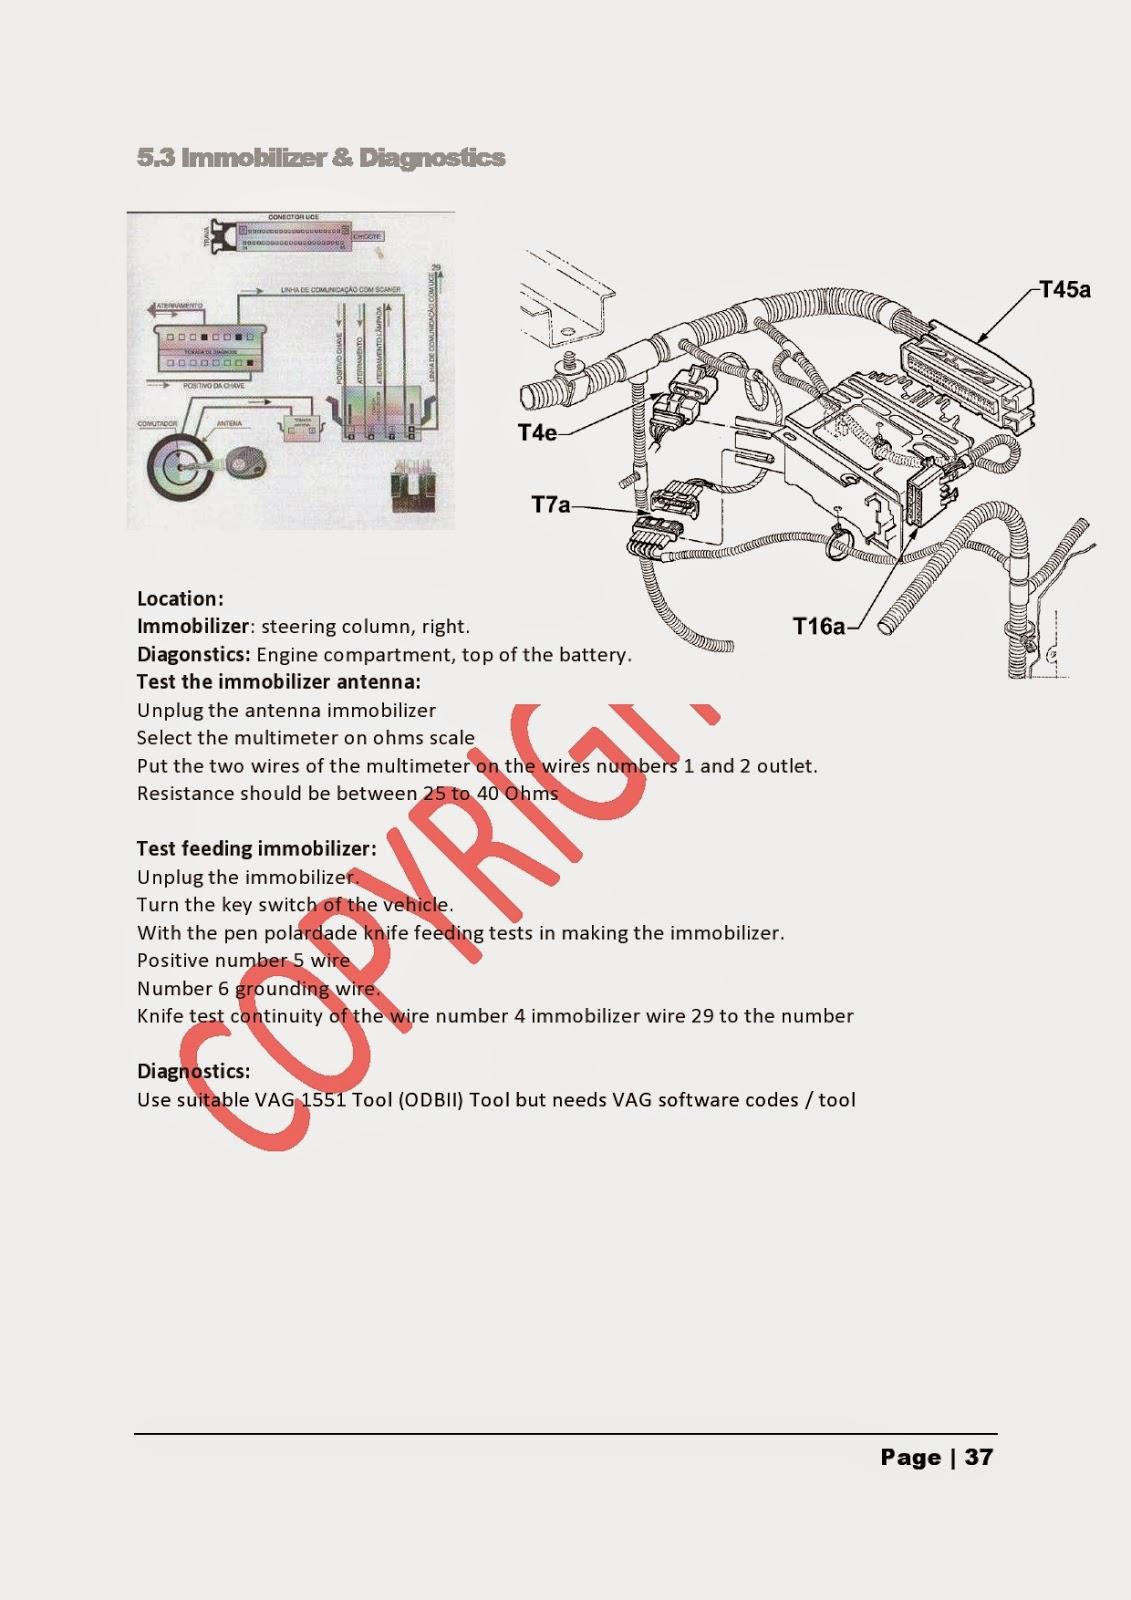 Brazilian Kombi Technical Service Manual